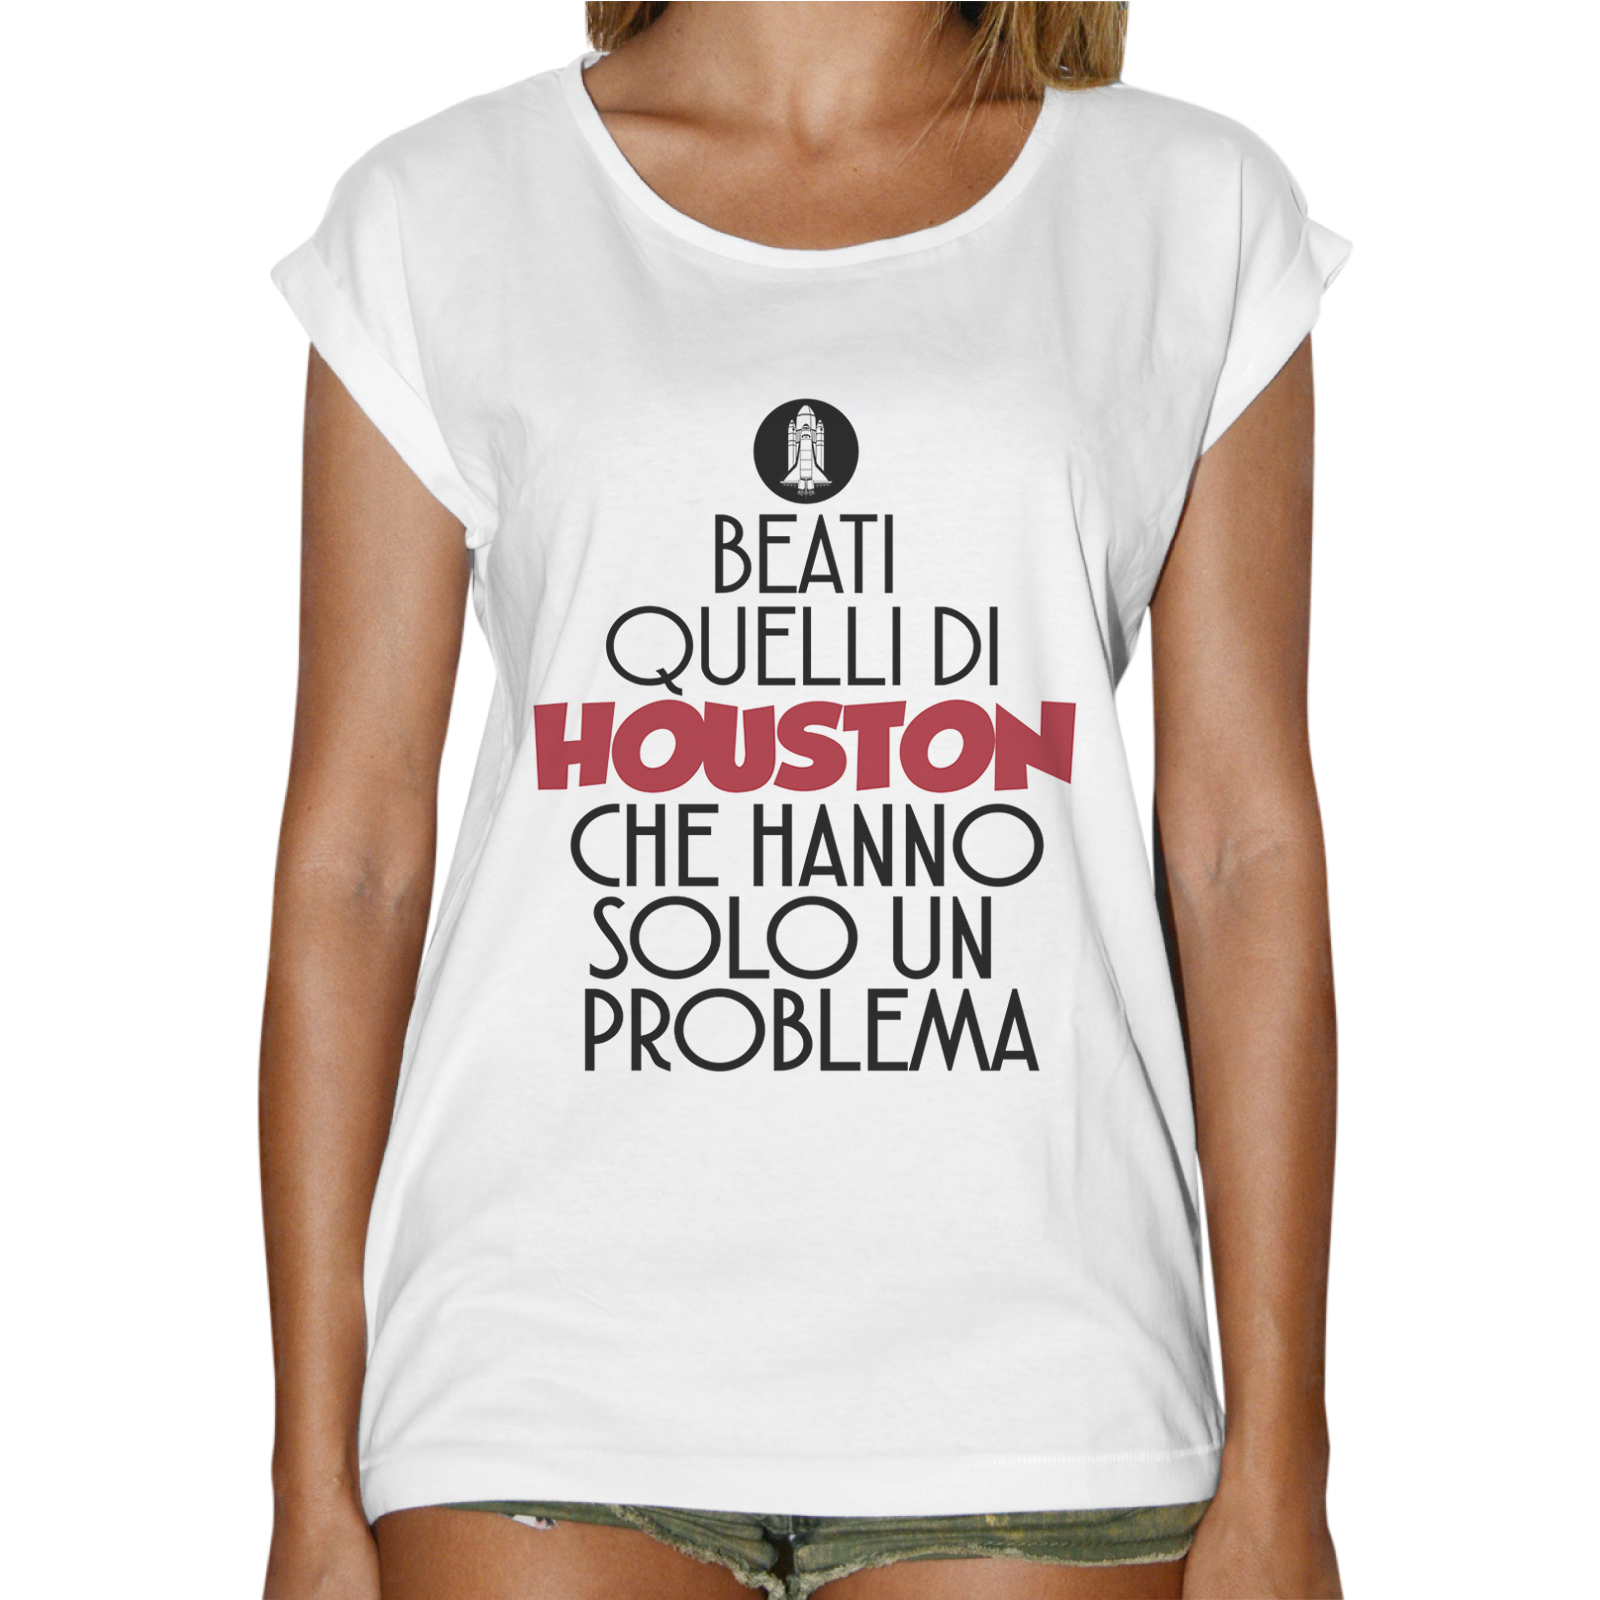 T-Shirt Donna Fashion BEATI QUELLI DI HOUSTON